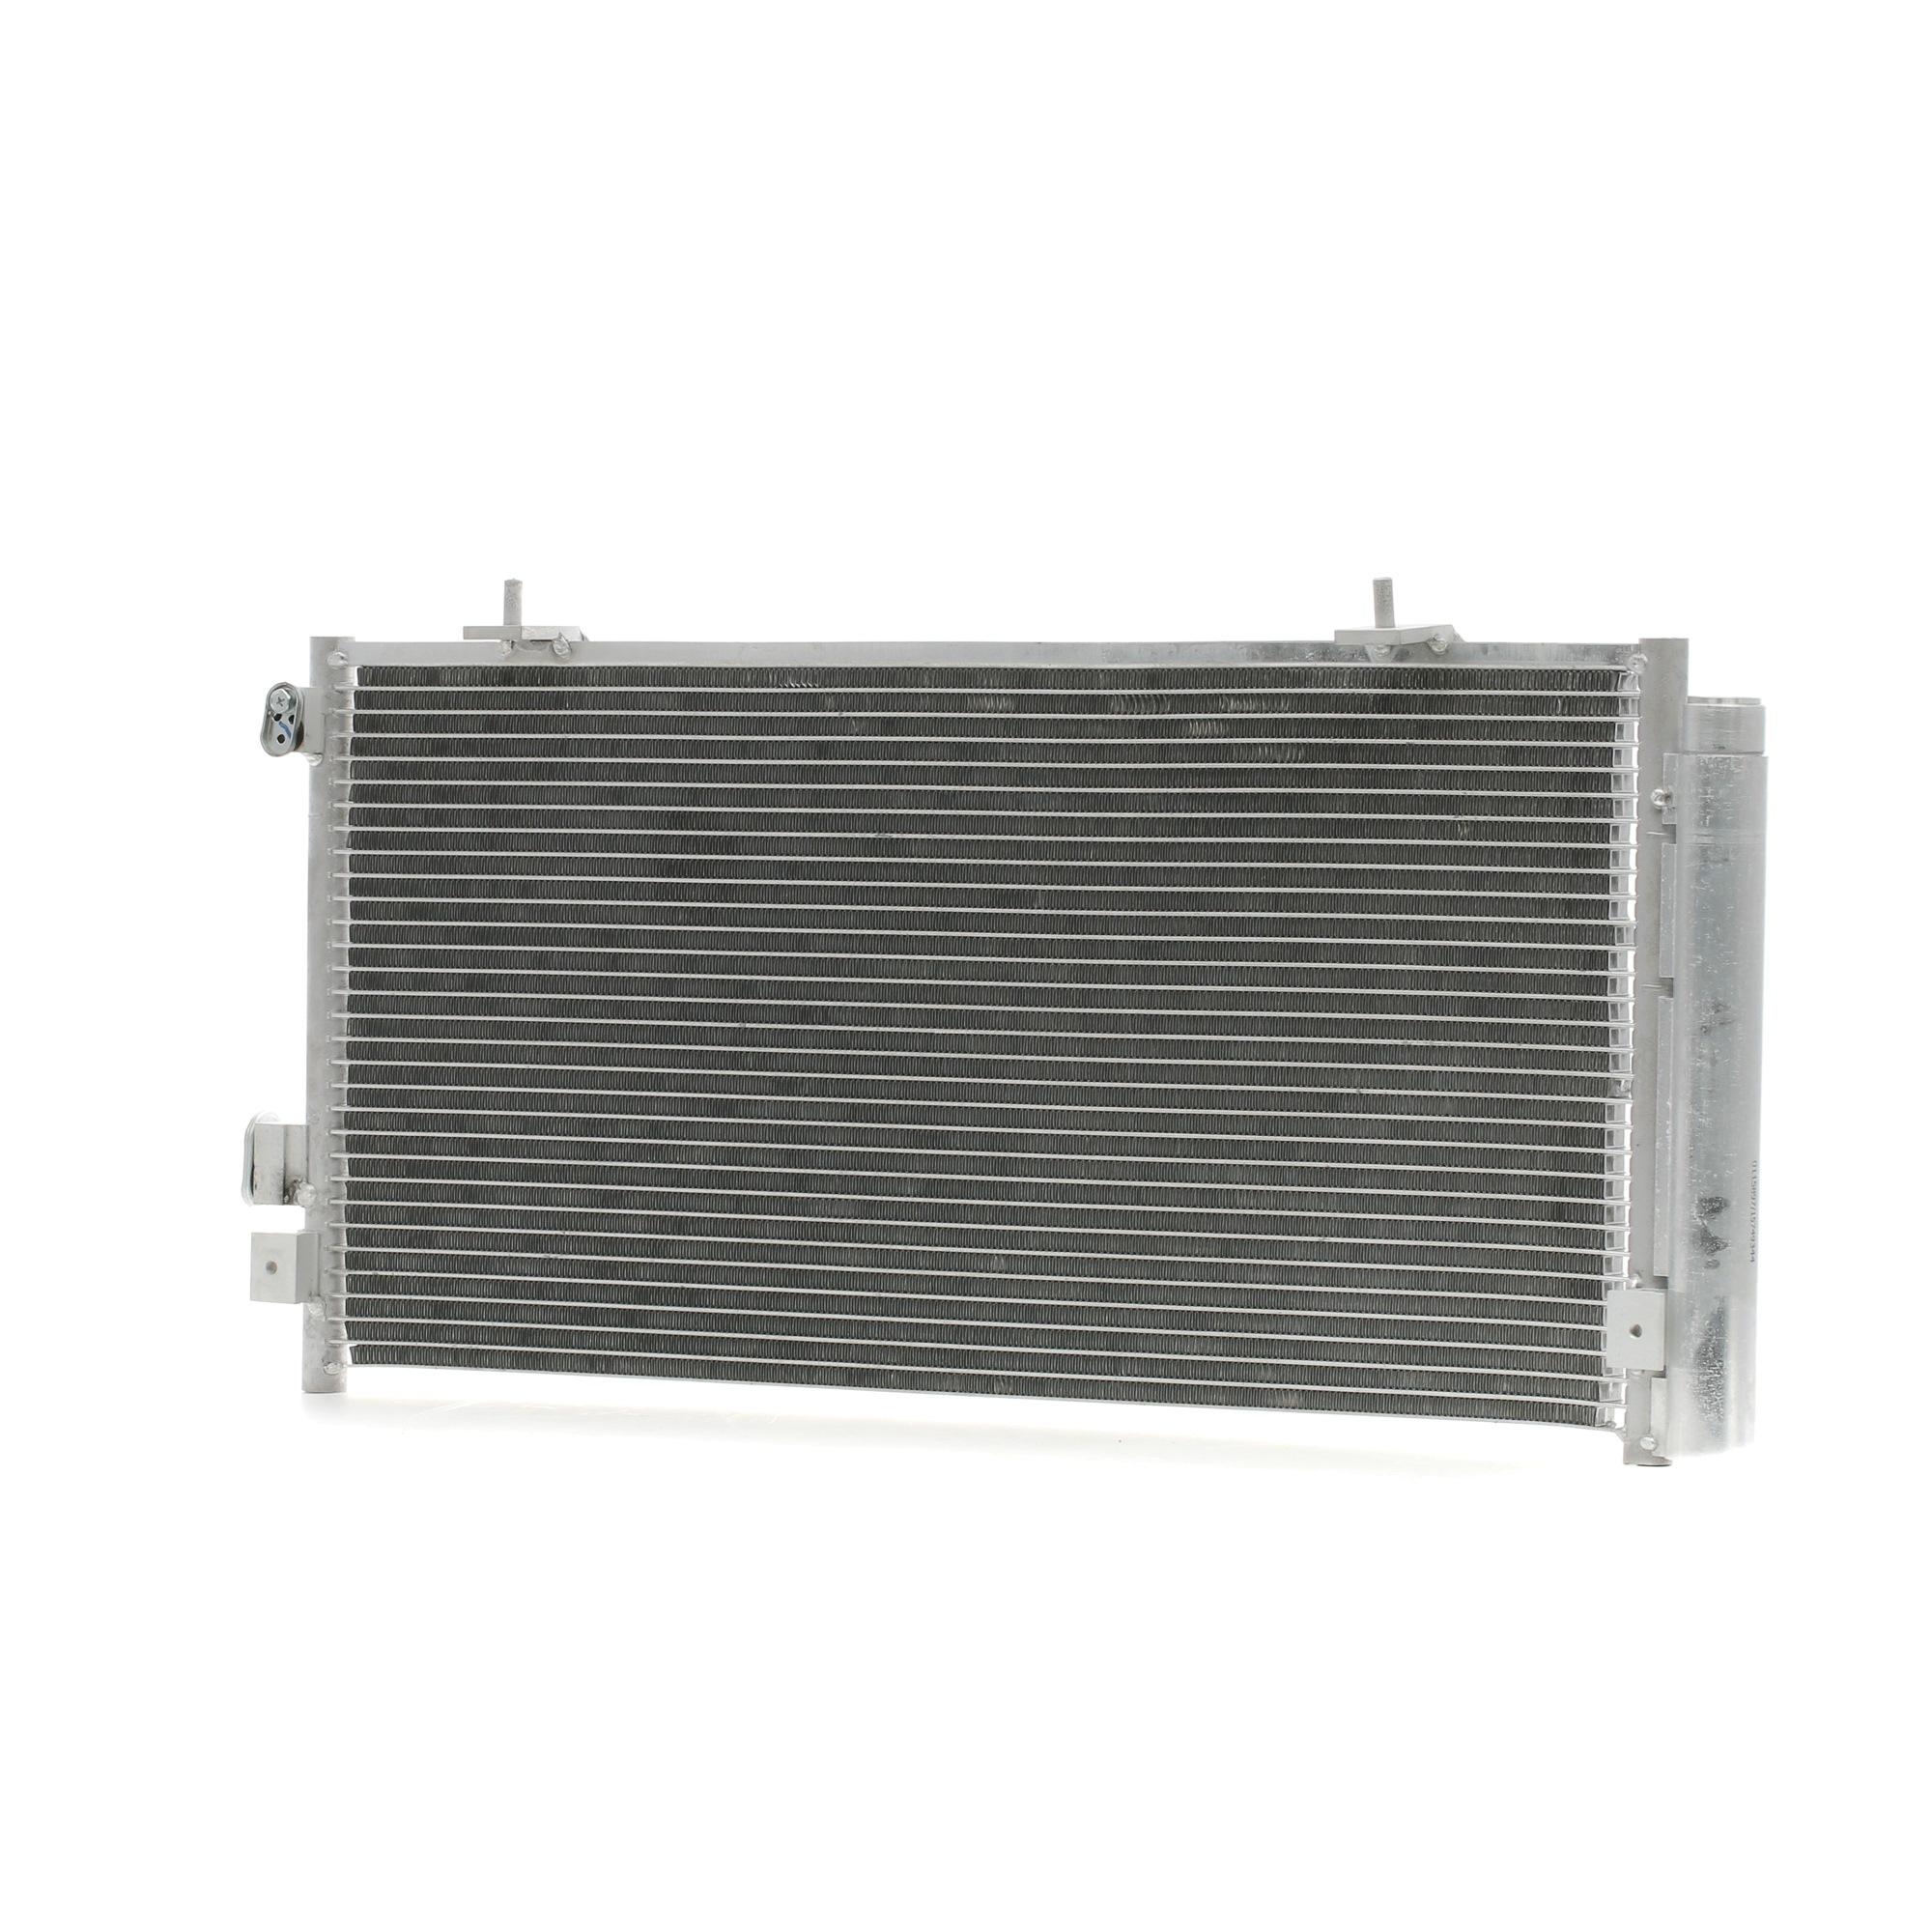 Kondensator STARK SKCD-0110582 Bewertung